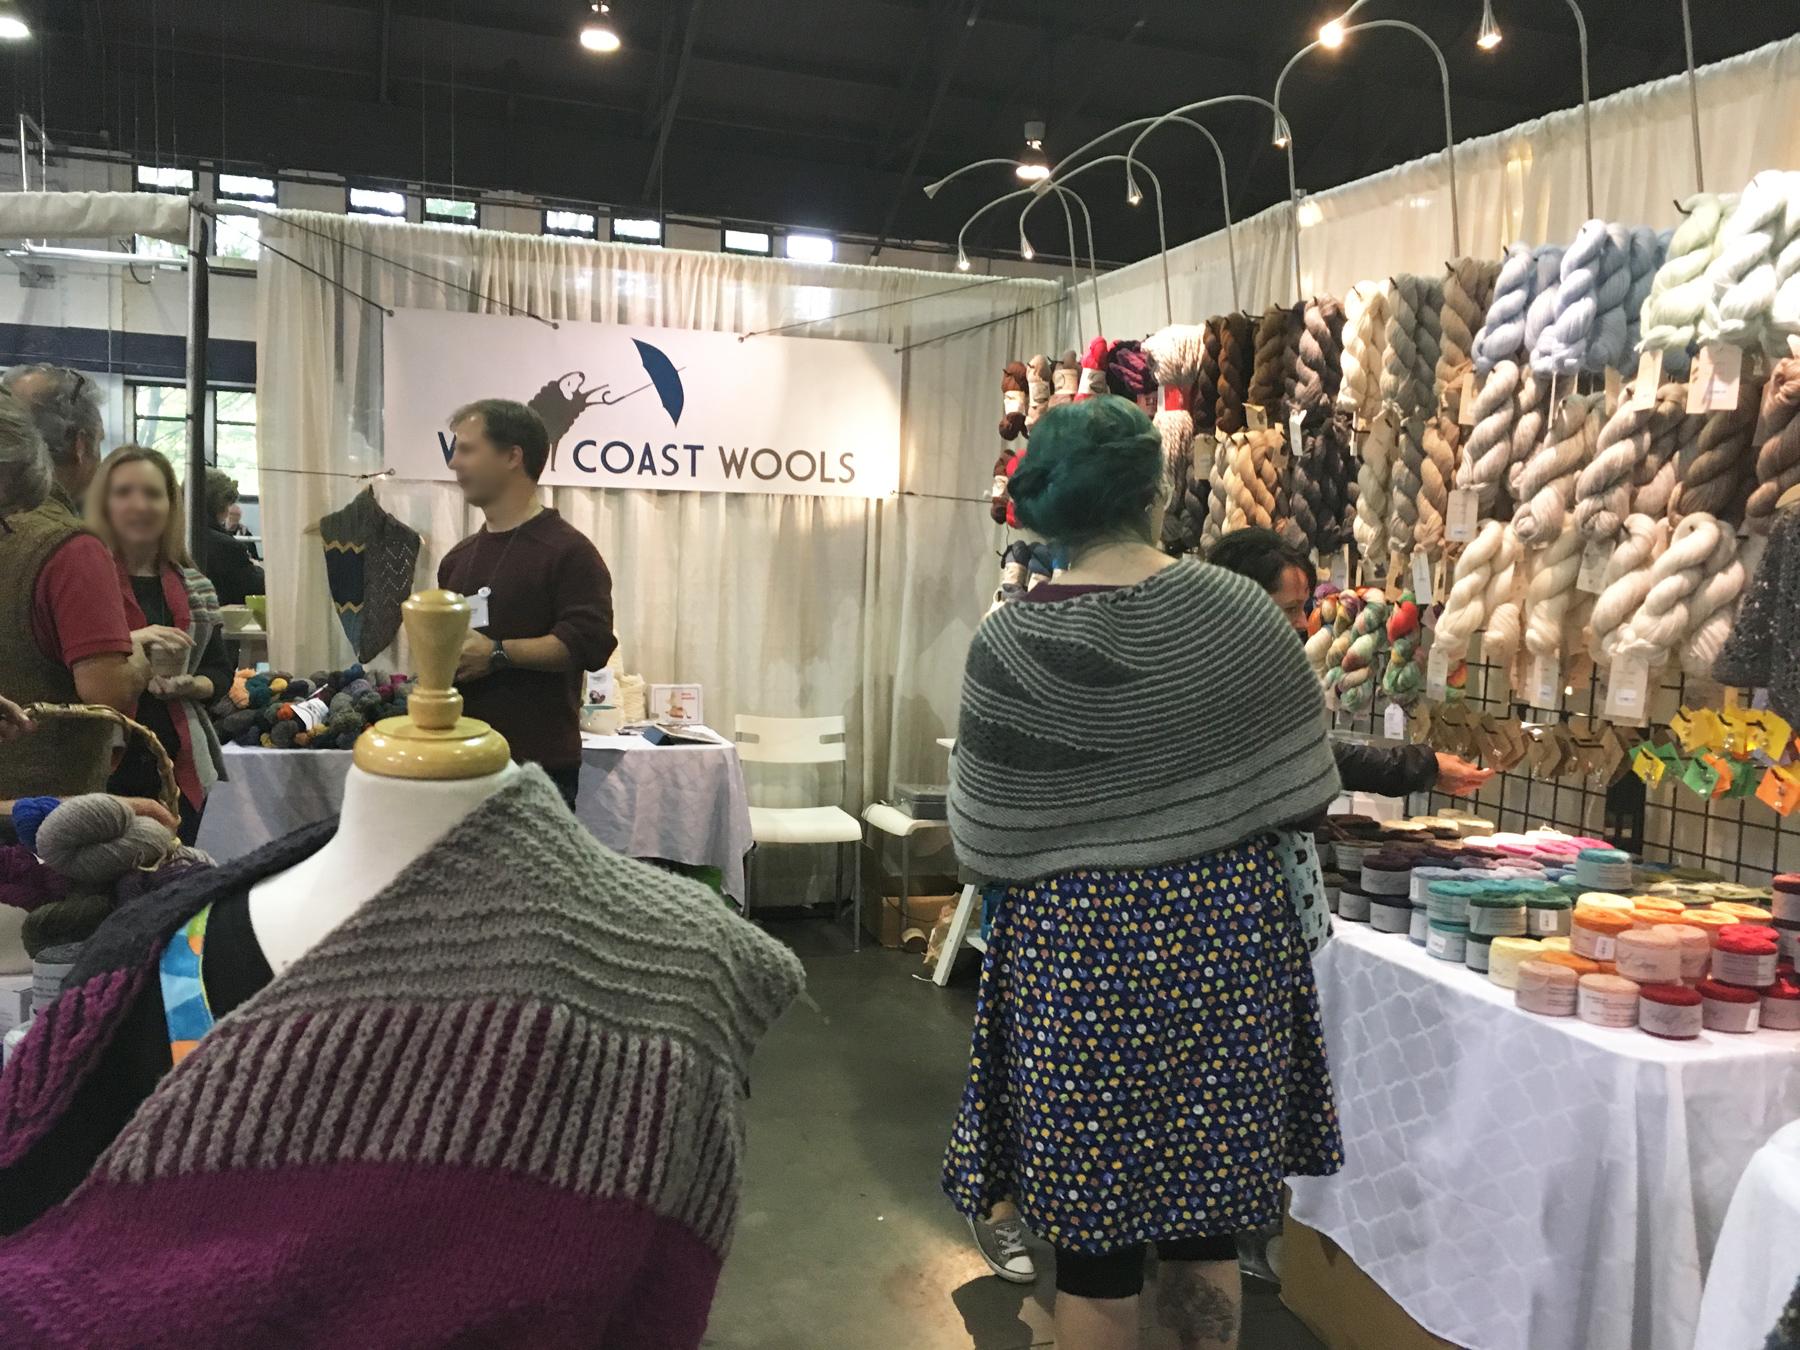 Wet Coast Wools